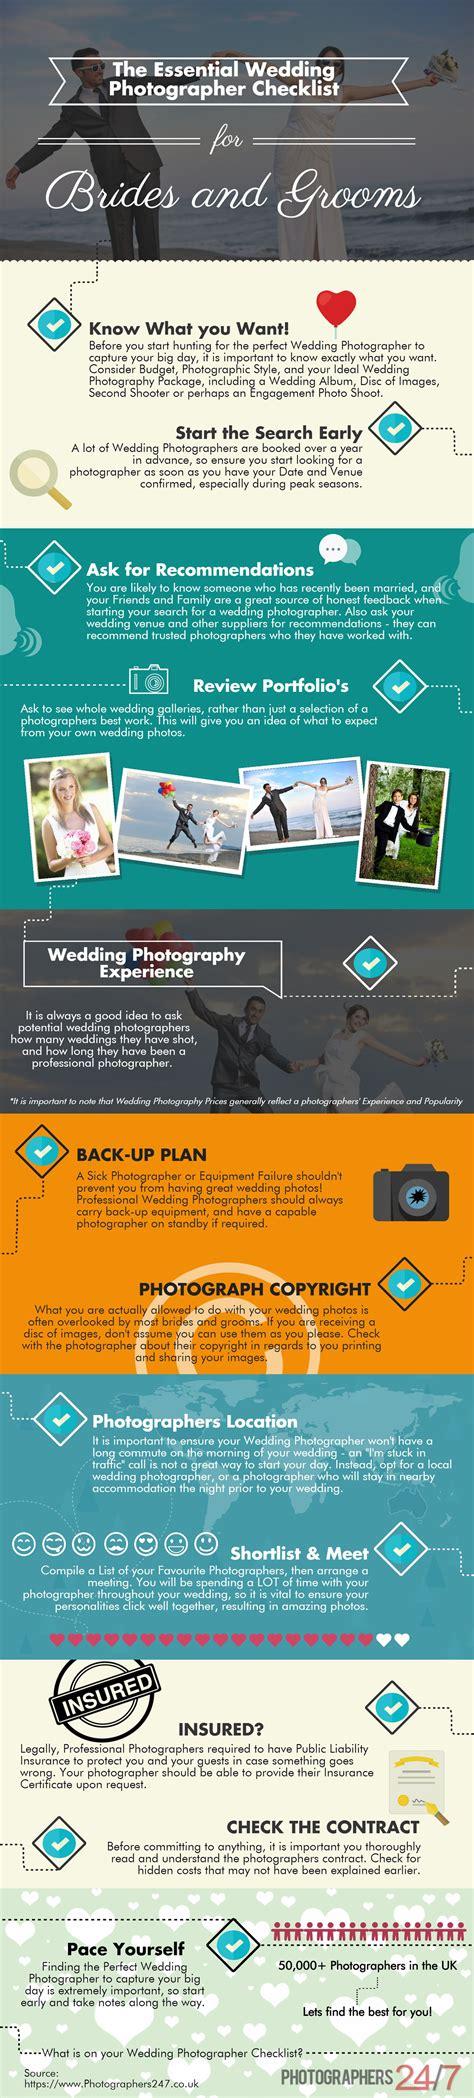 Asian Wedding Checklist Uk by Photographers 24 7 The Essential Wedding Photographer